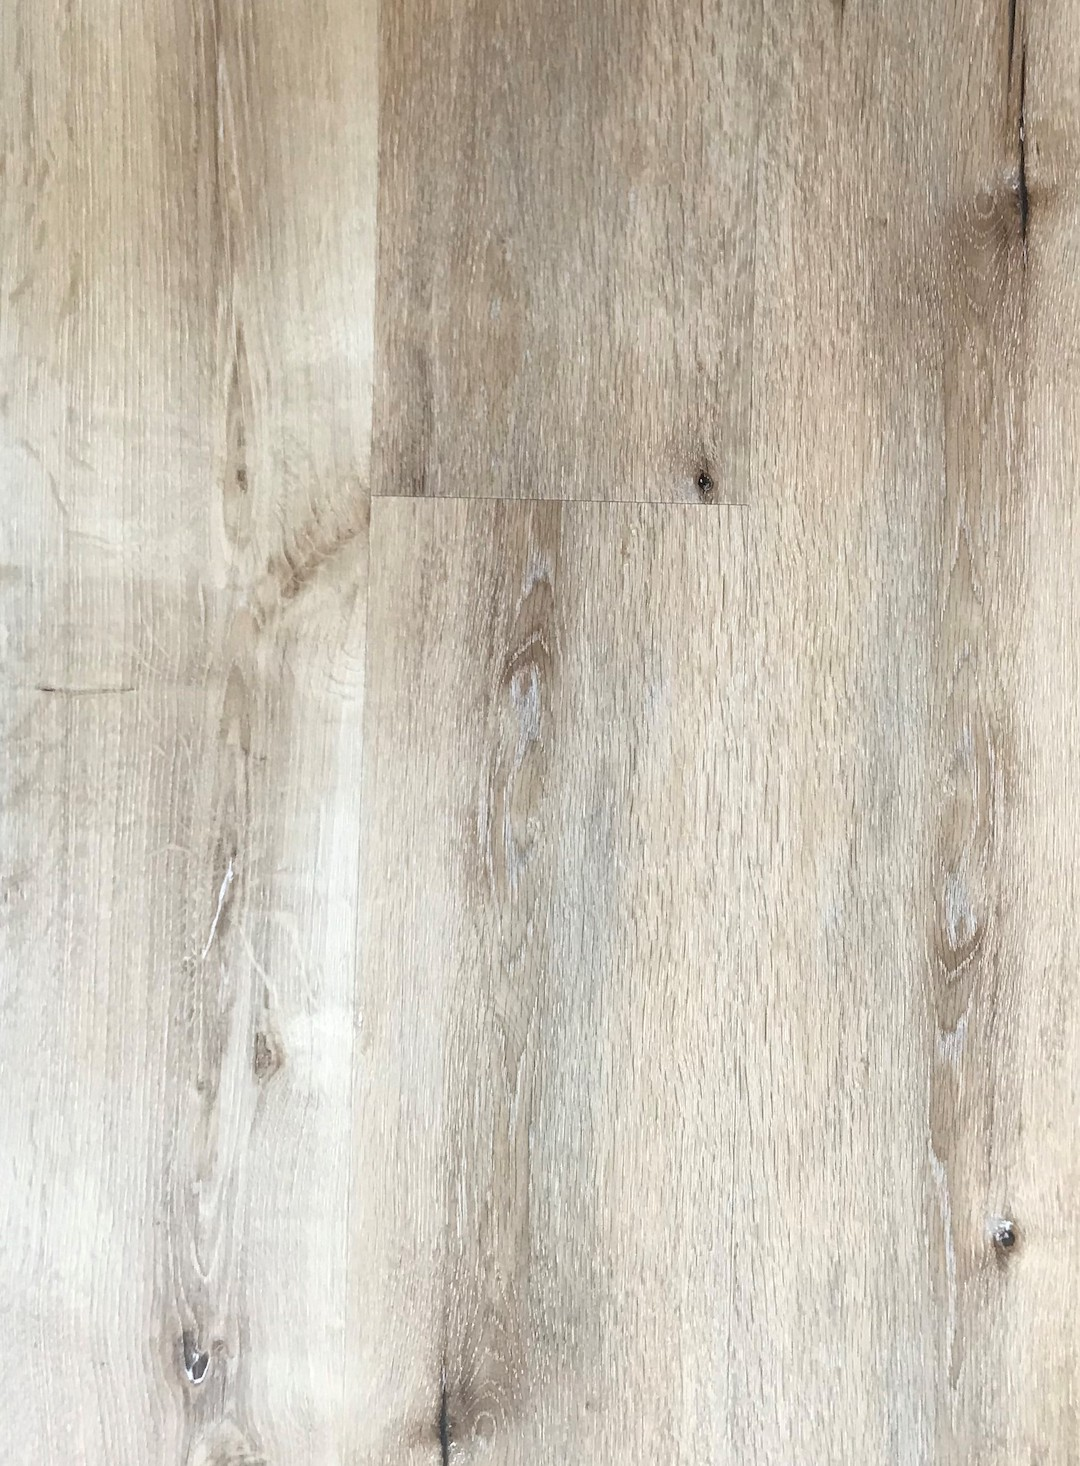 Vinylboden Eiche V521 Landhausdiele matt, V-Fuge umlaufend